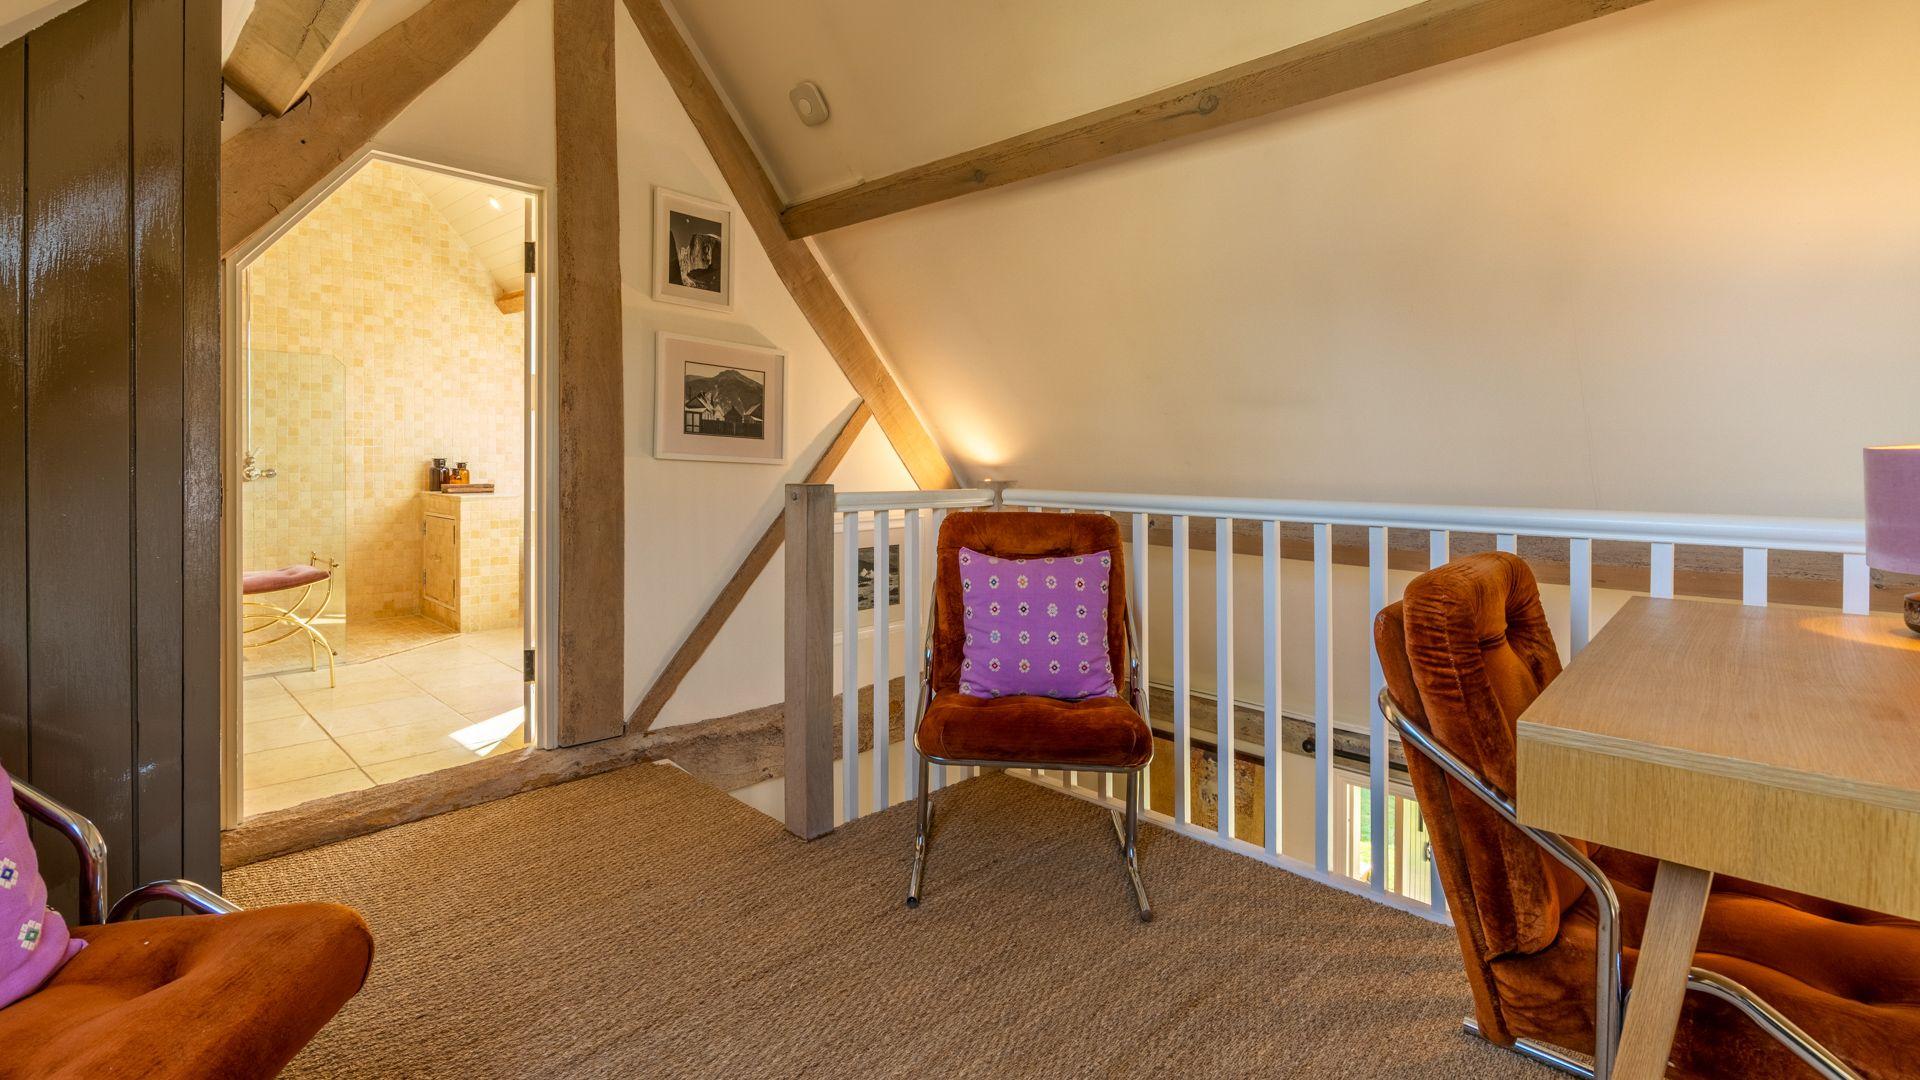 Mezzanine with desk and chairs, Quail House, Bolthole Retreats